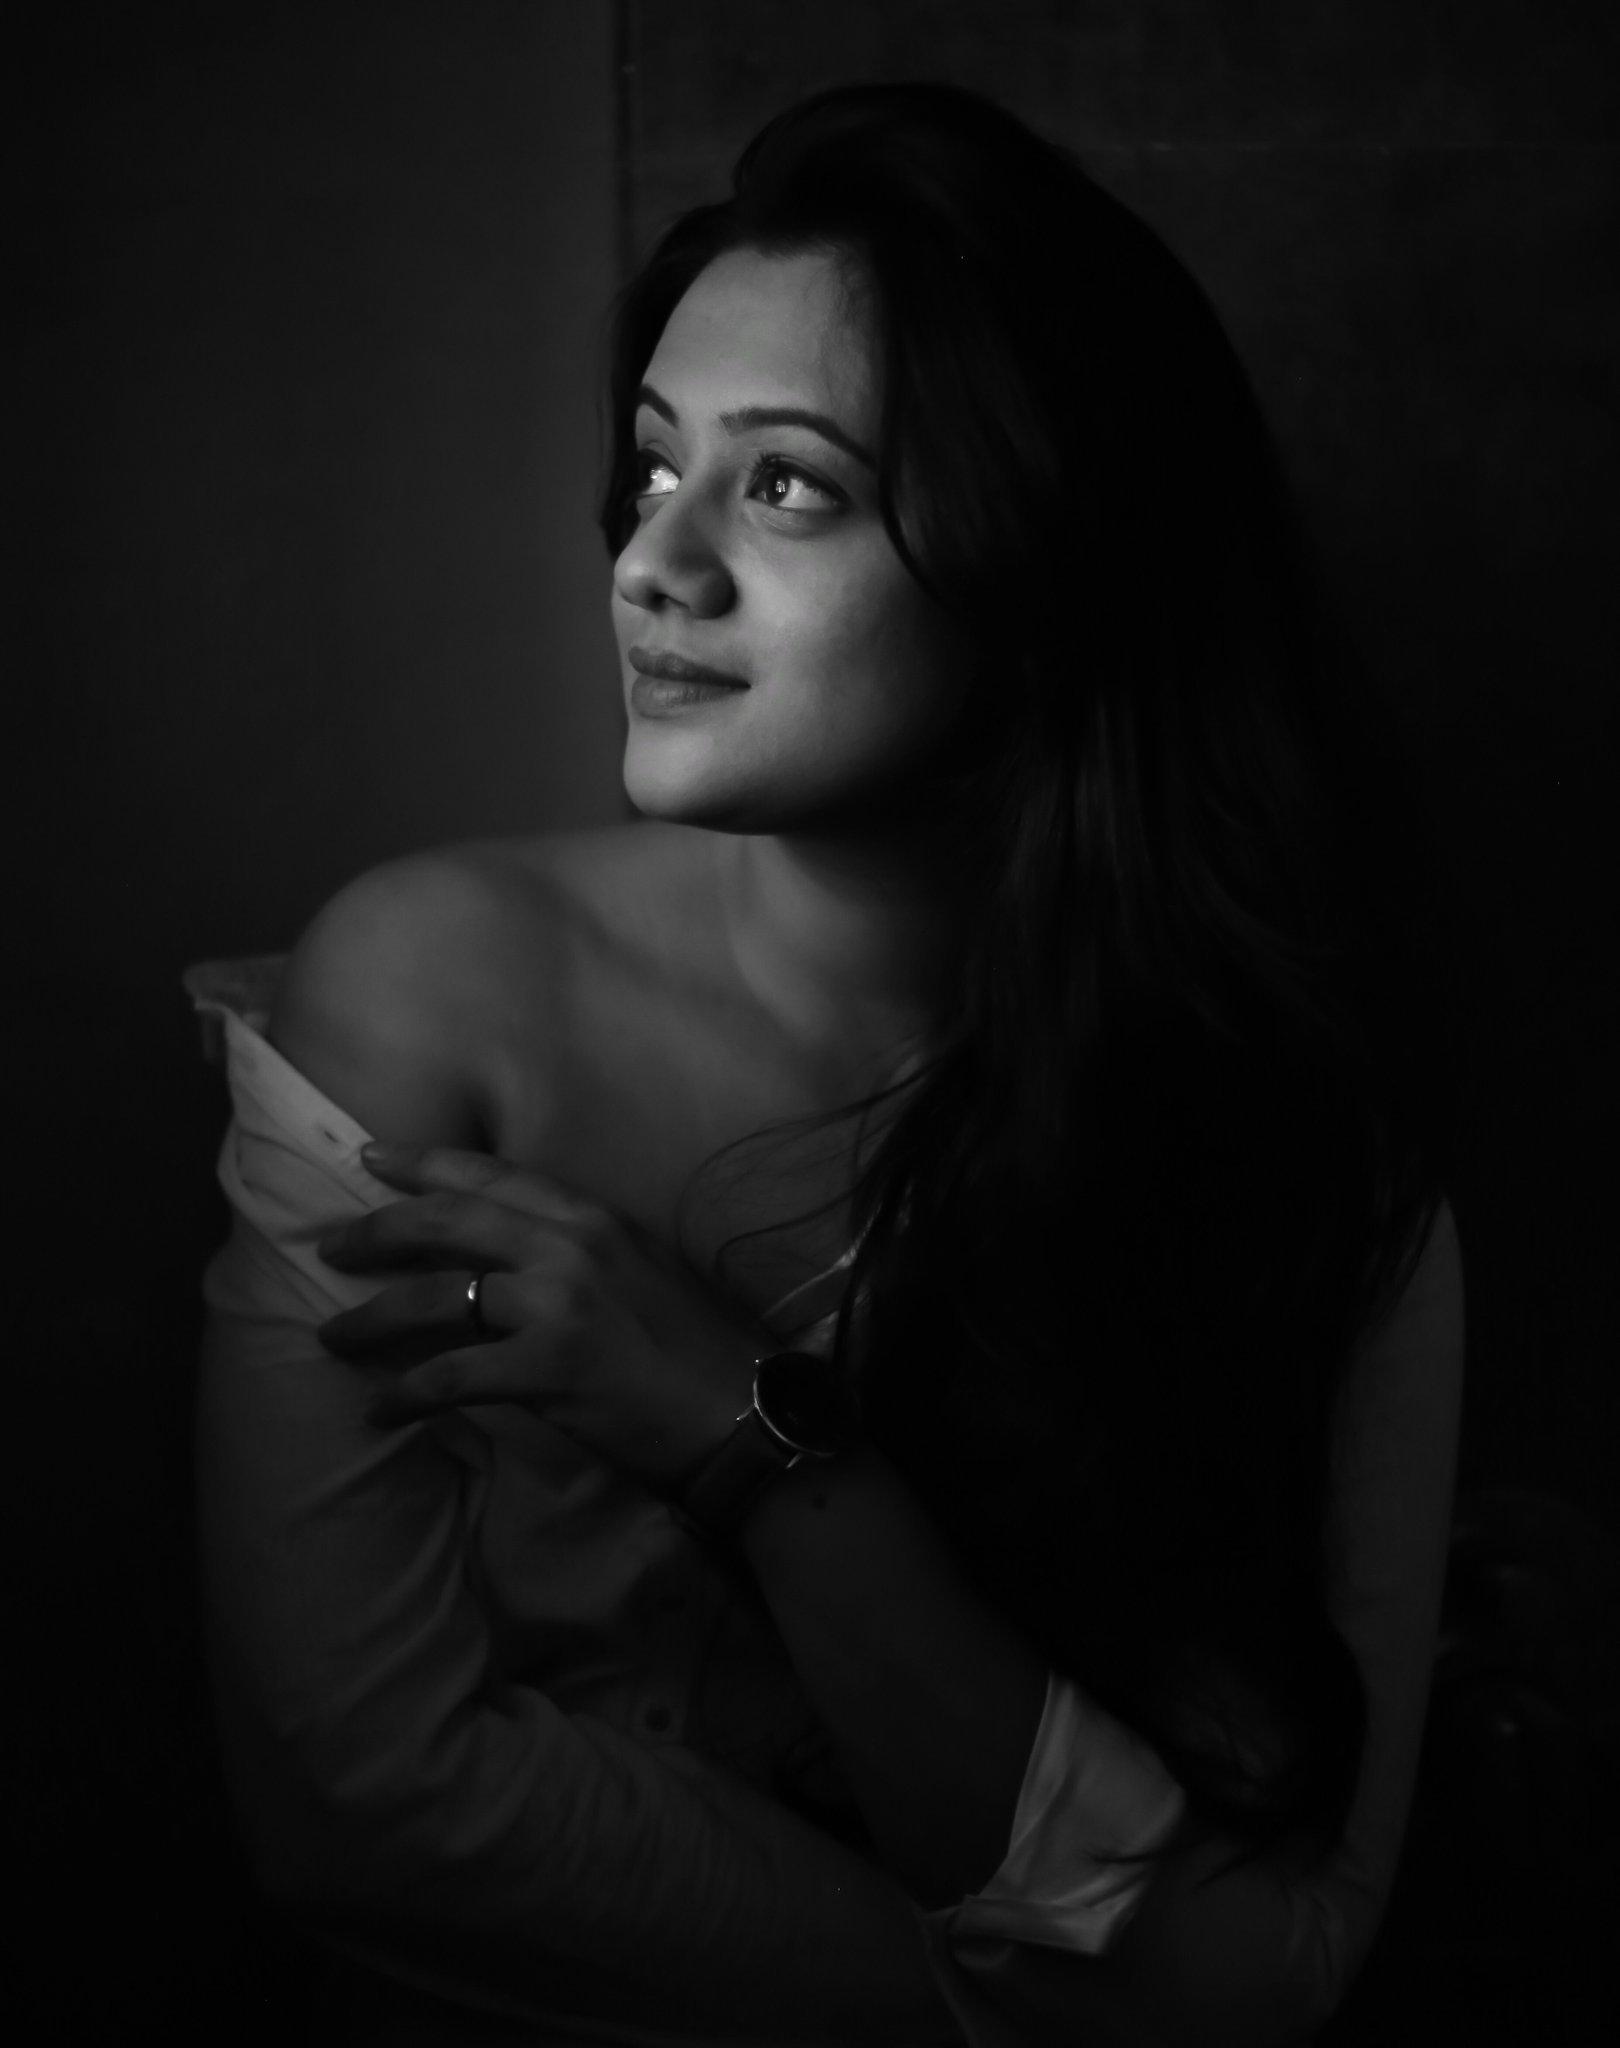 beautiful_black_and_white_portrait_photography_62.jpg